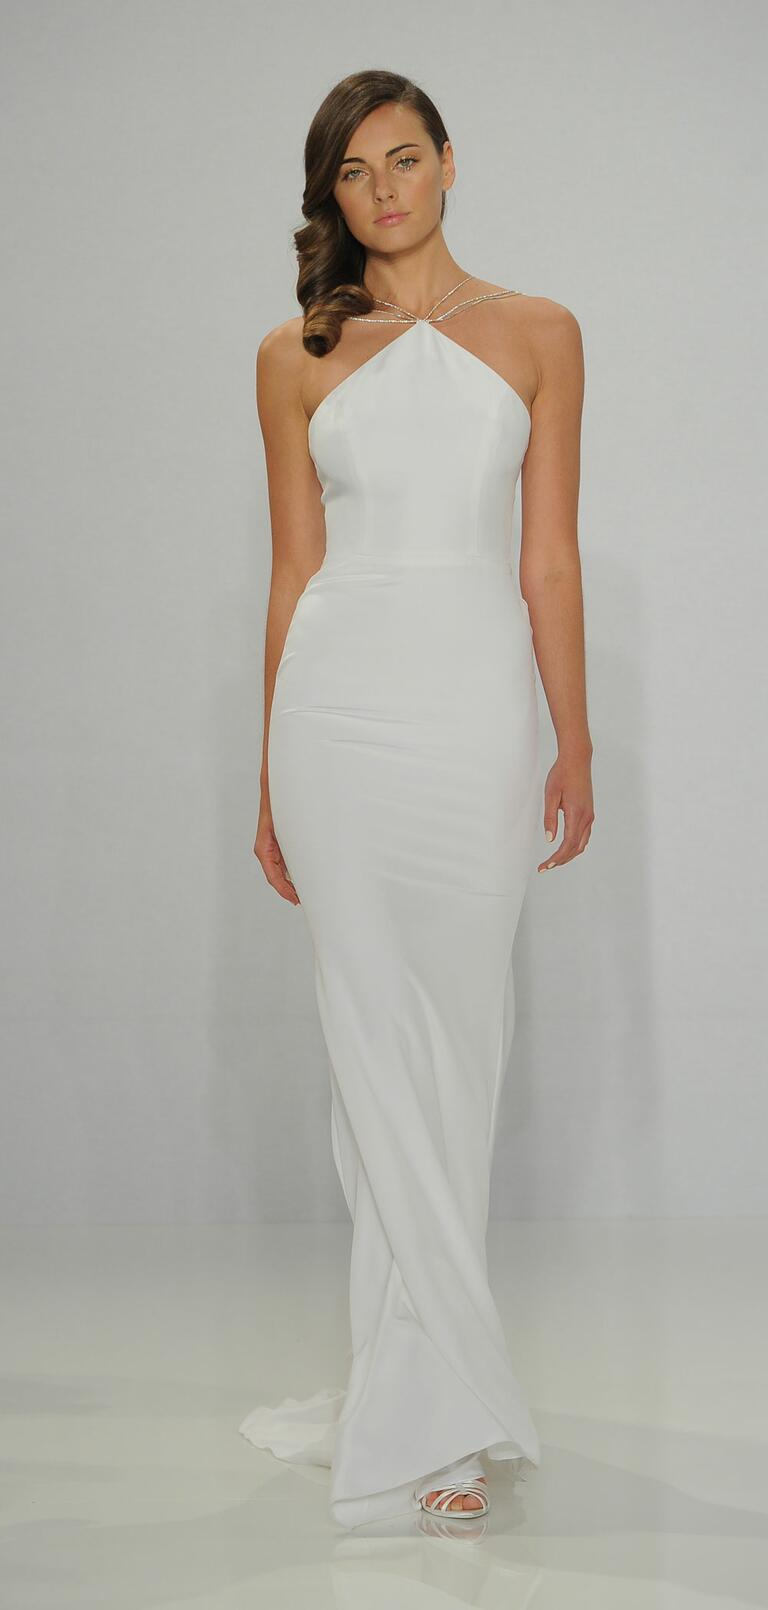 Christian Siriano Spring 2017 multi-strap halter wedding dress